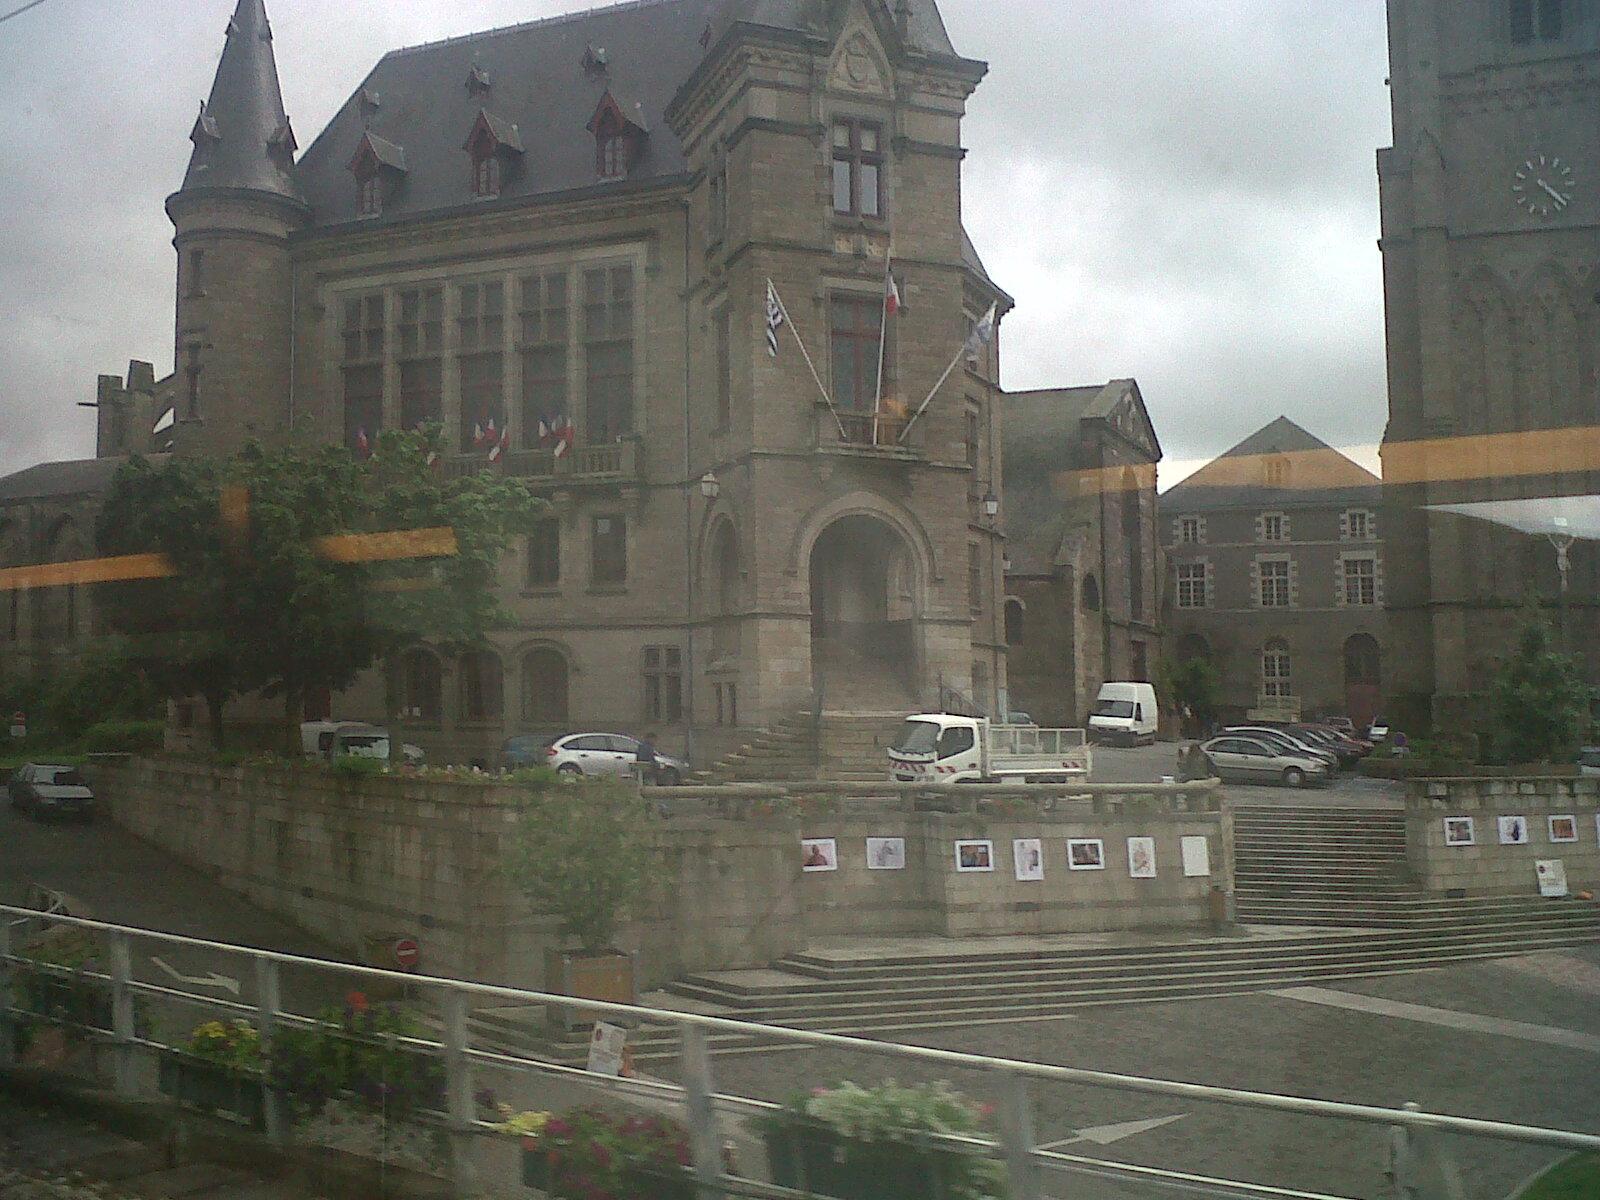 redon hotel de ville train passing jun12